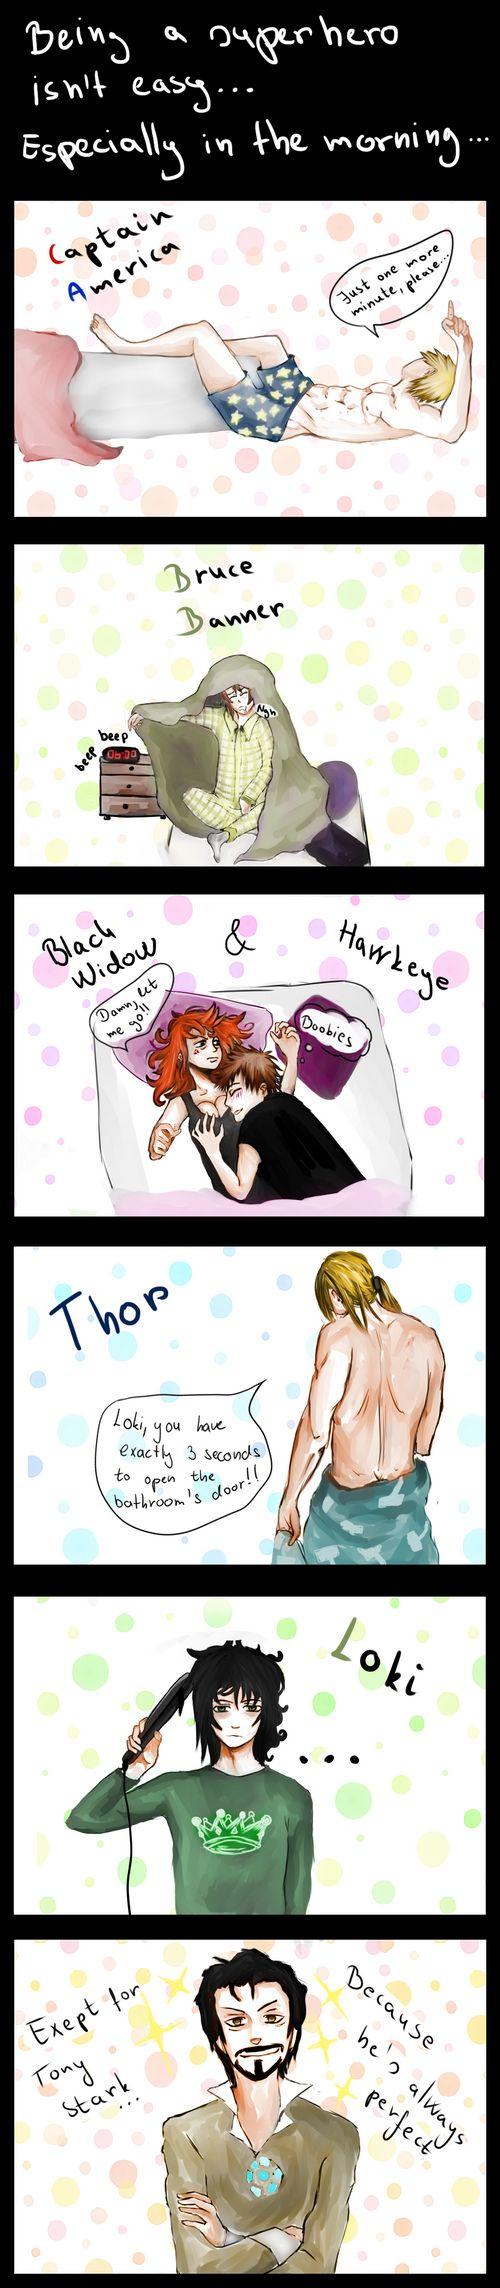 I love how Loki's doing his hair.